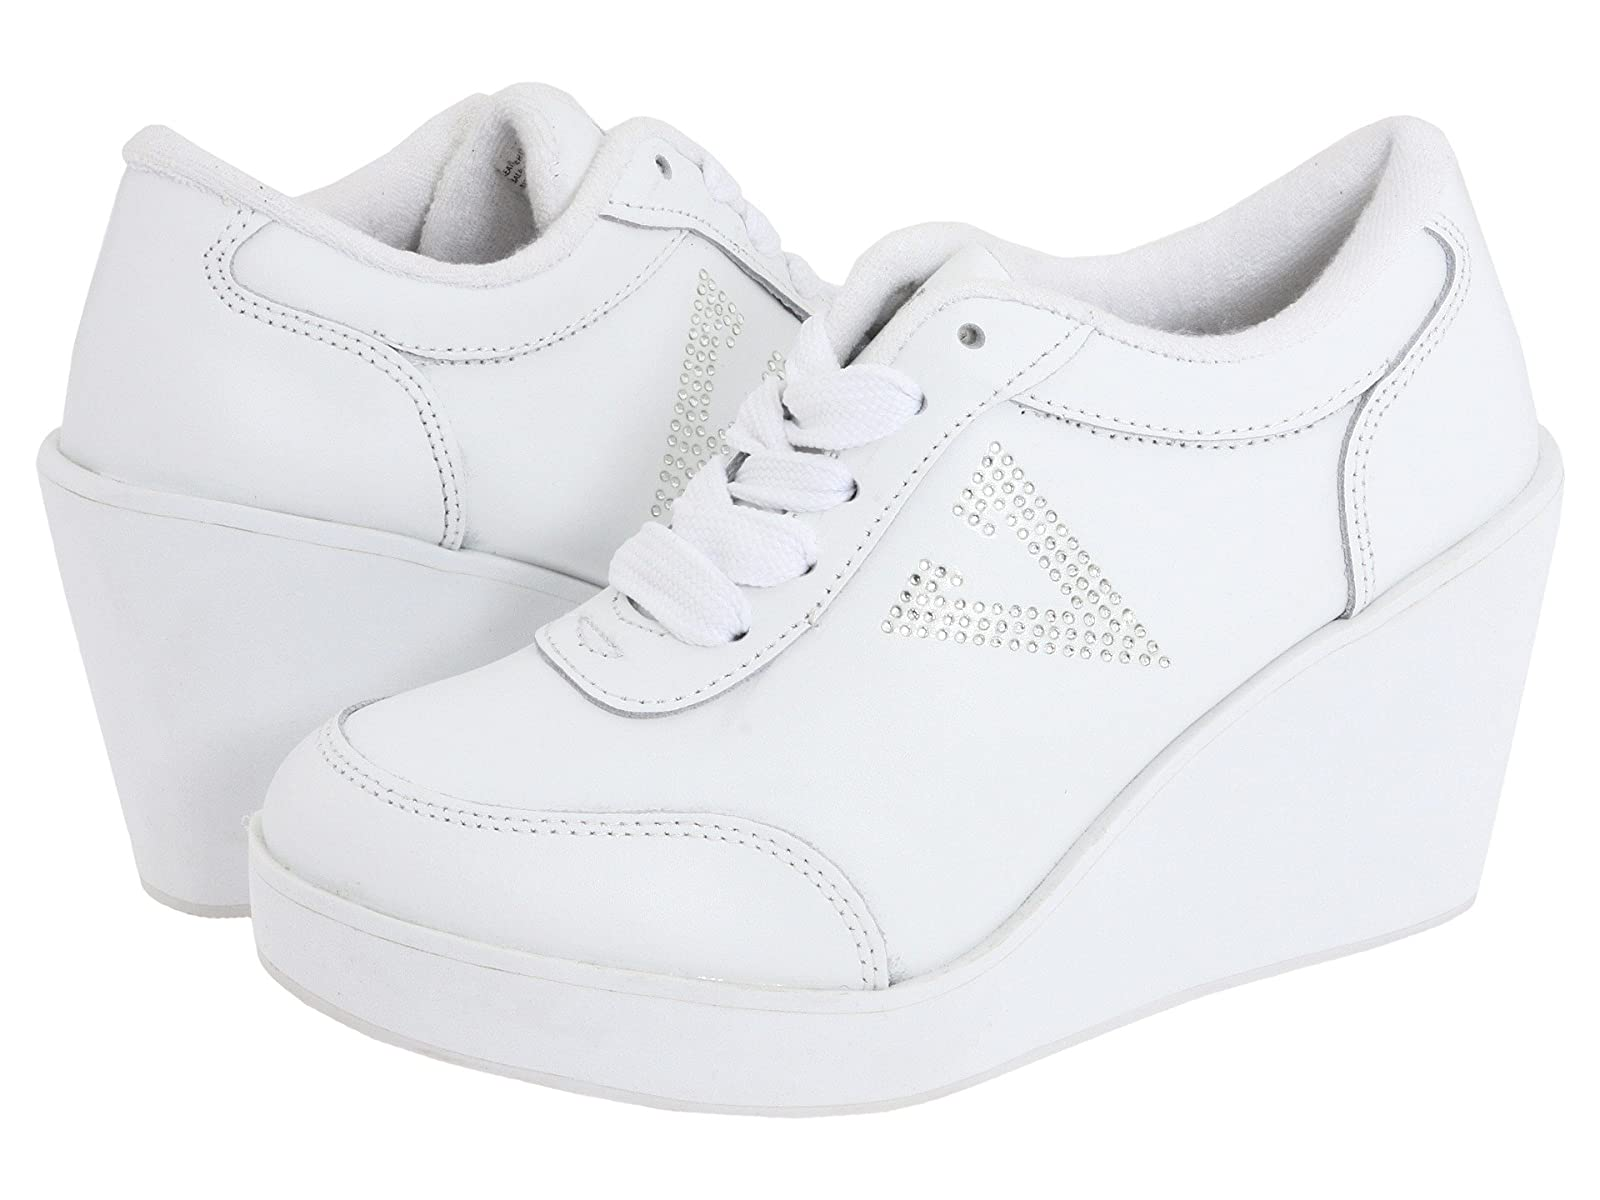 VOLATILE CashAtmospheric grades have affordable shoes